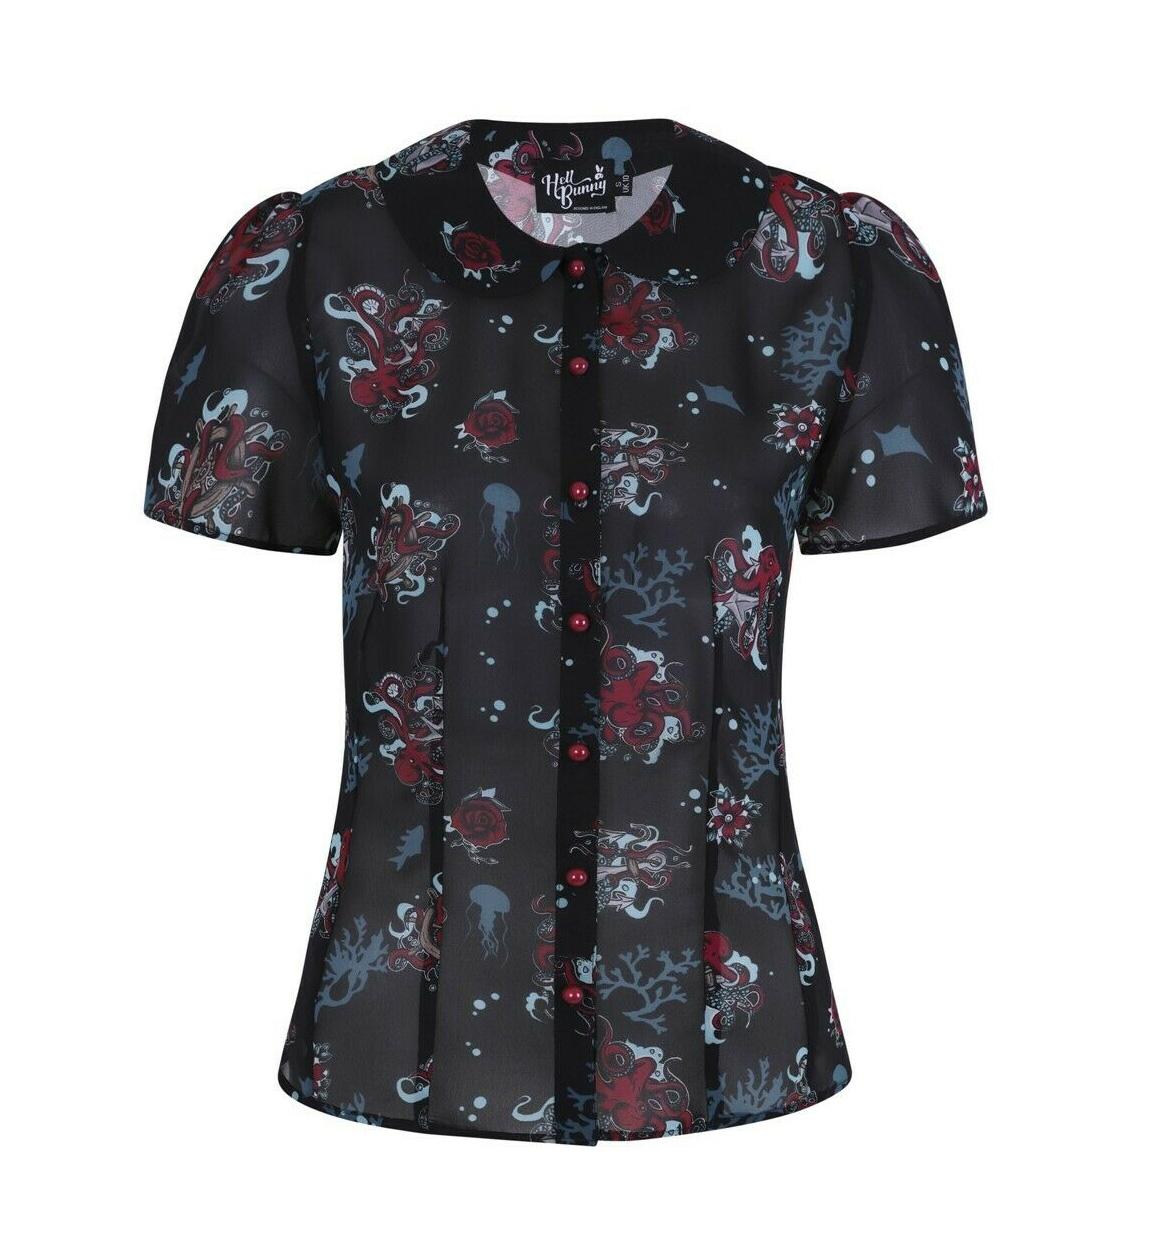 Hell-Bunny-50s-Shirt-Top-Black-Ocean-Octopus-Roses-POSEIDON-Blouse-All-Sizes thumbnail 23